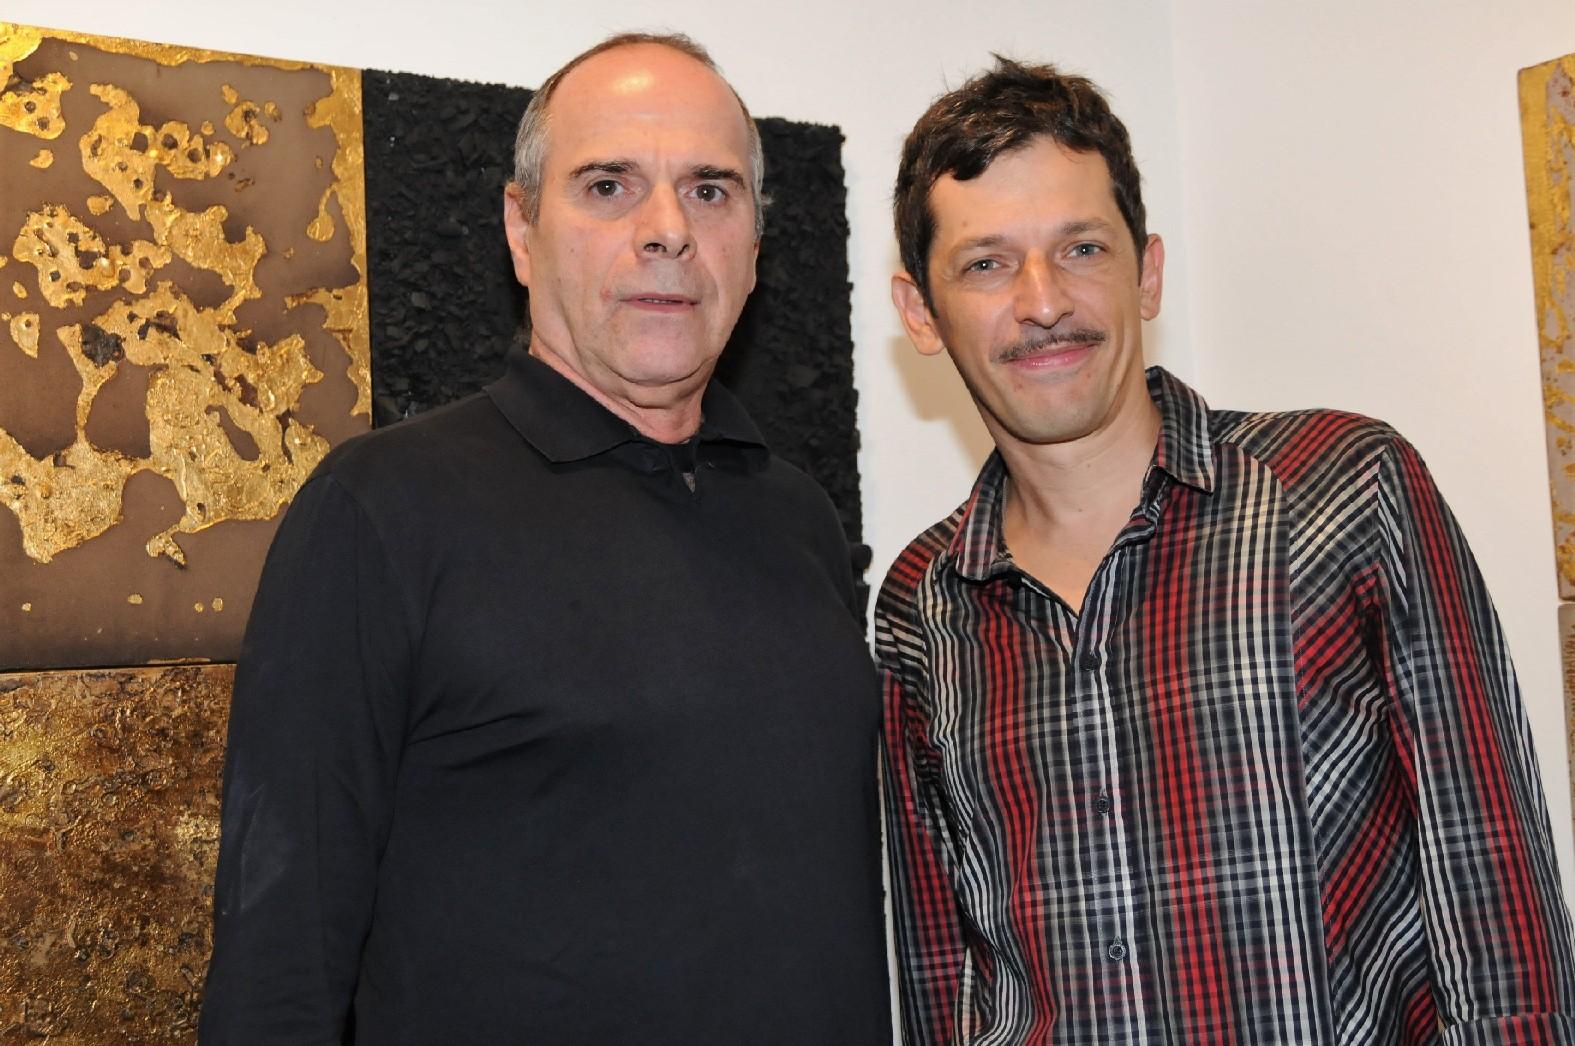 Kikyto Amaral e Paolo Nadalin (1)